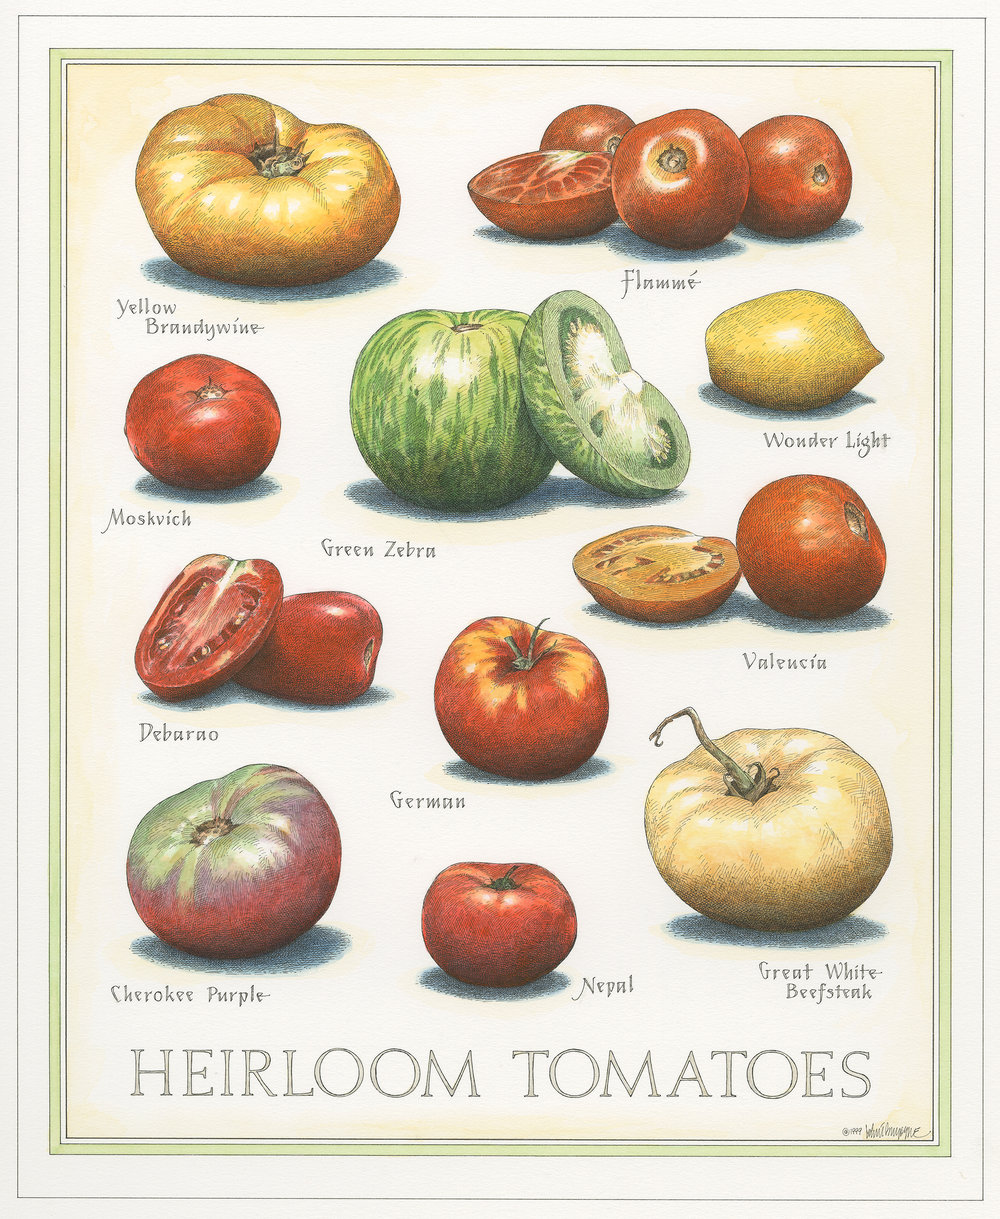 Heirloom Tomatoes finish001 small.jpg